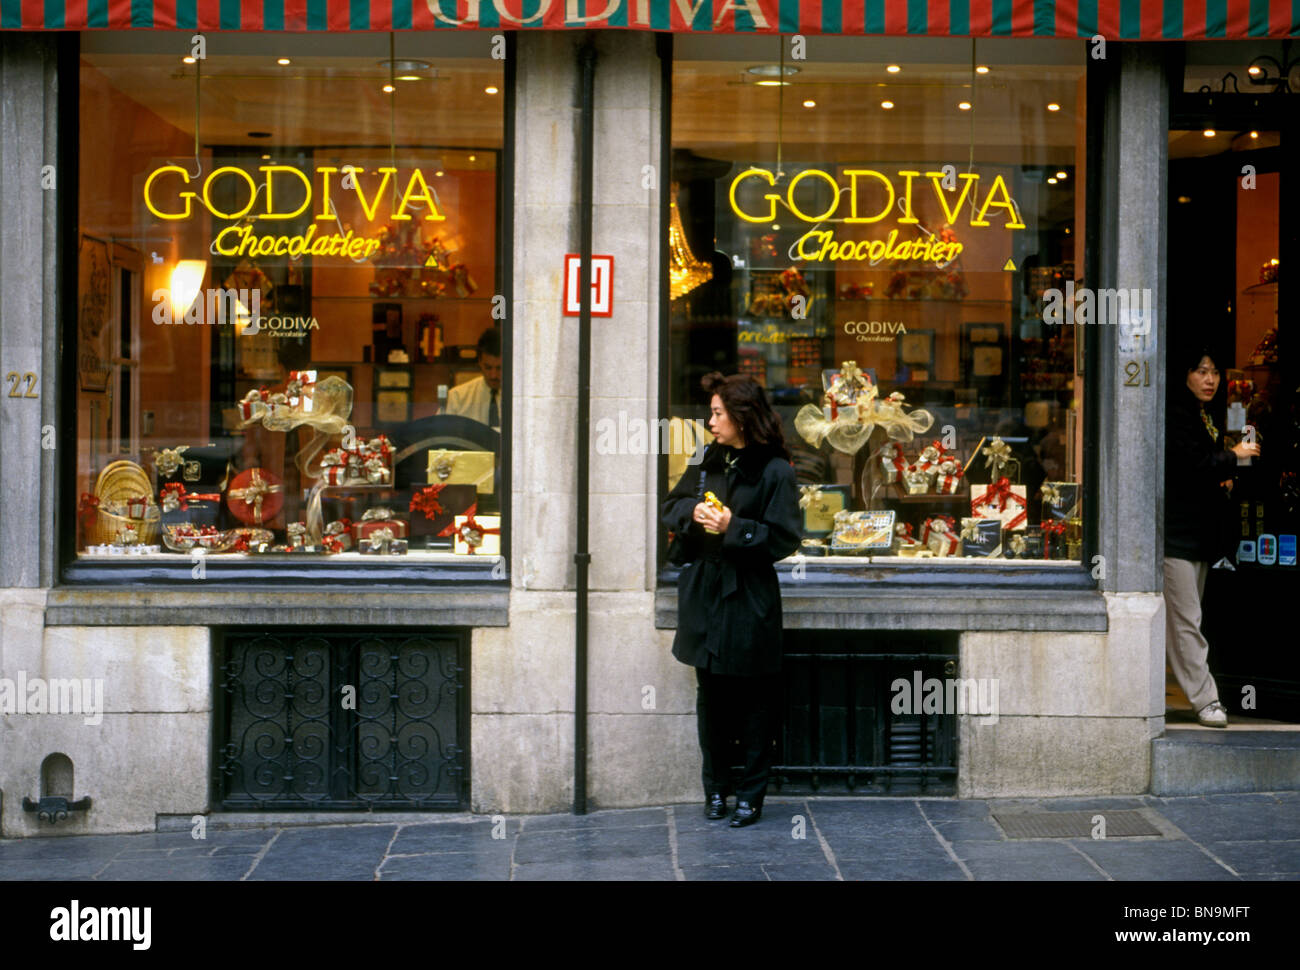 tourist, Godiva, Godiva chocolate, chocolate, chocolates Stock ...